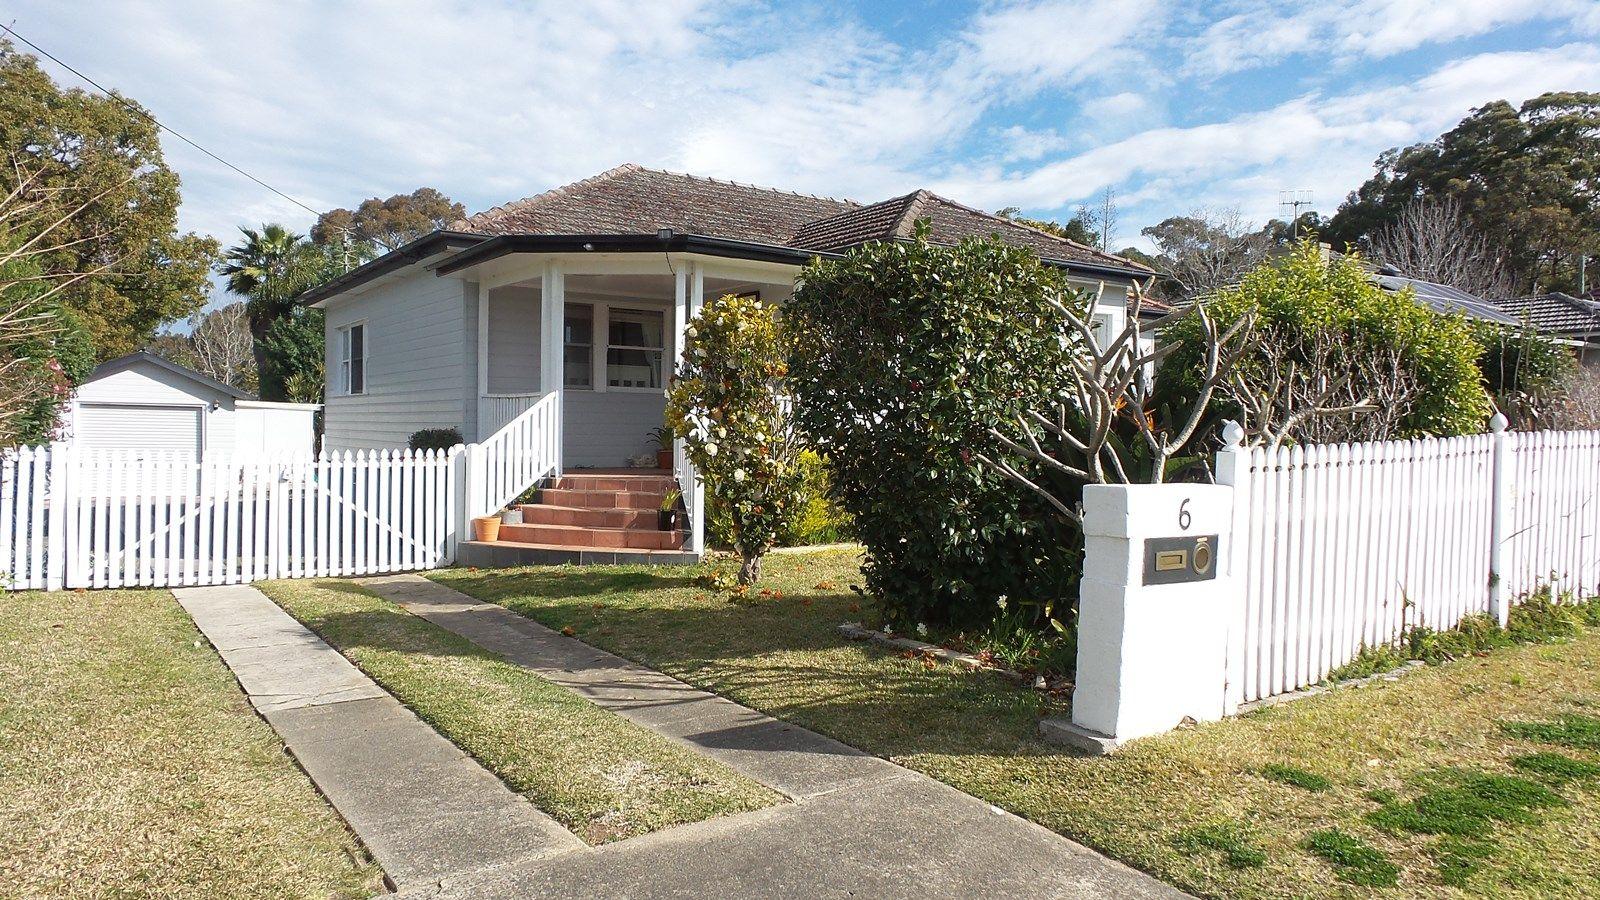 6 Jervis Street, Nowra NSW 2541, Image 12